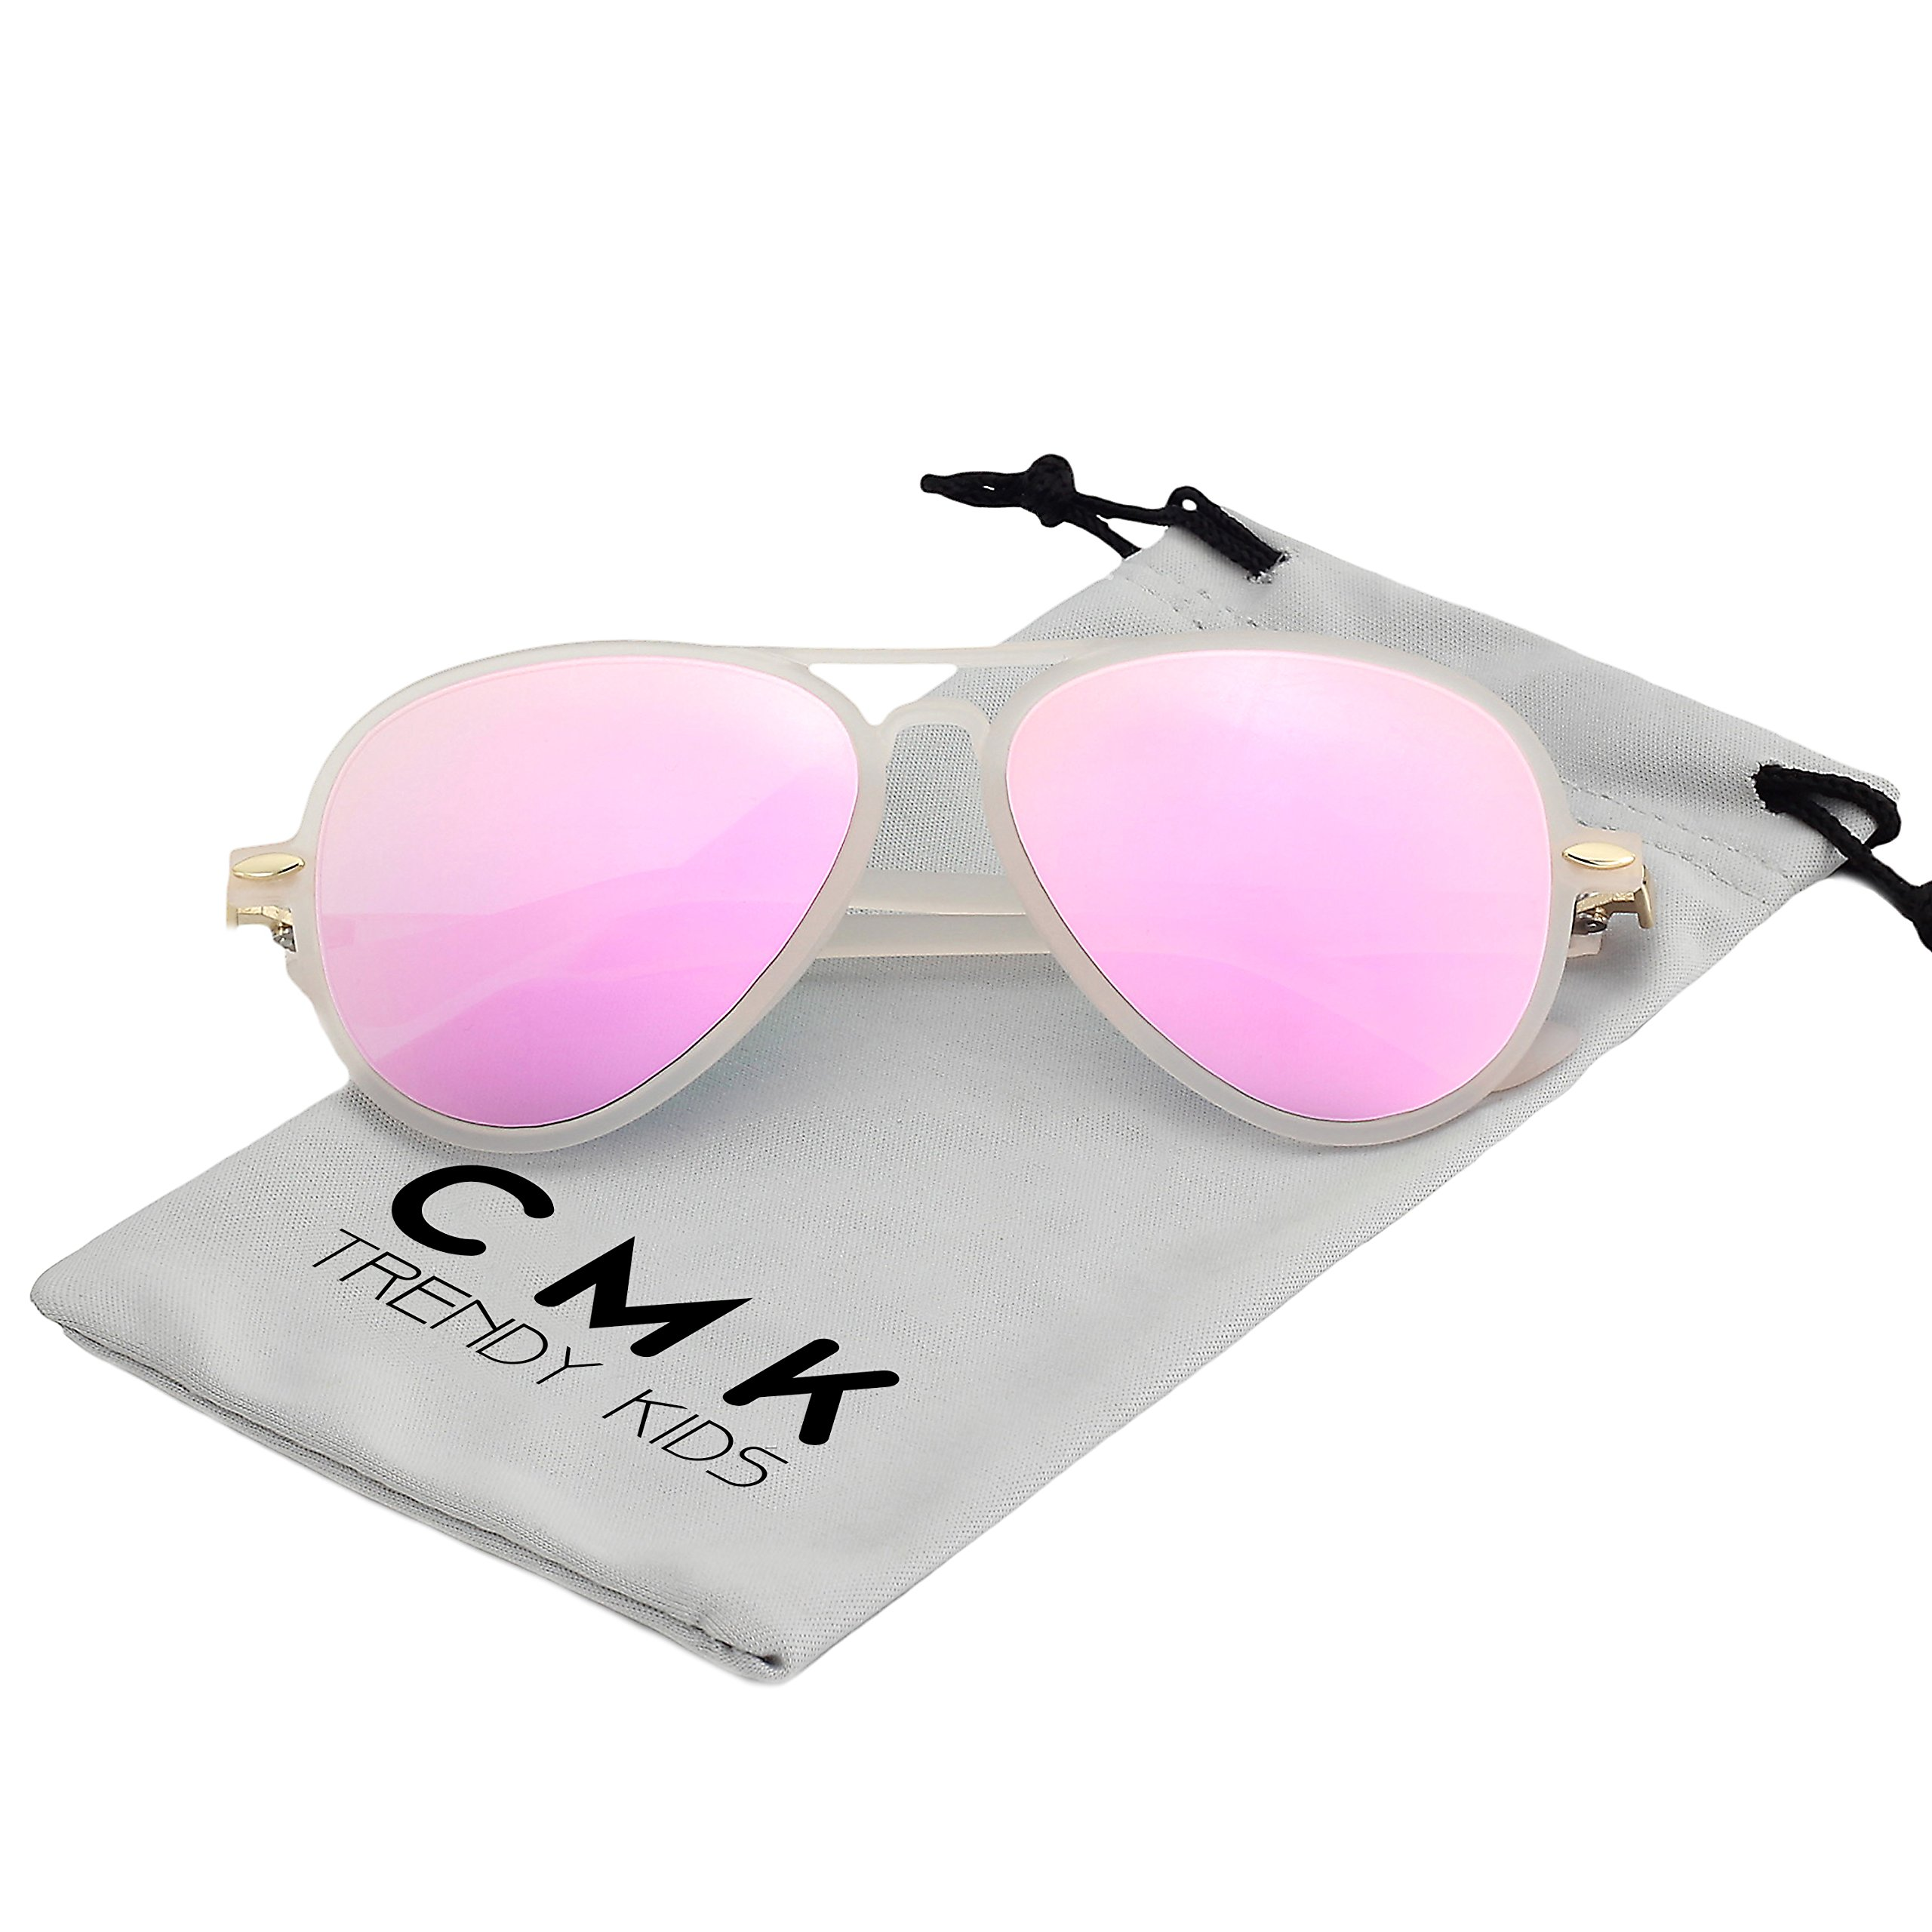 CMK Trendy Kids Flexible Kids Polarized Aviator Sunglasses for Boys and Girls Childrens Eyeglass (CMK180202_PK)